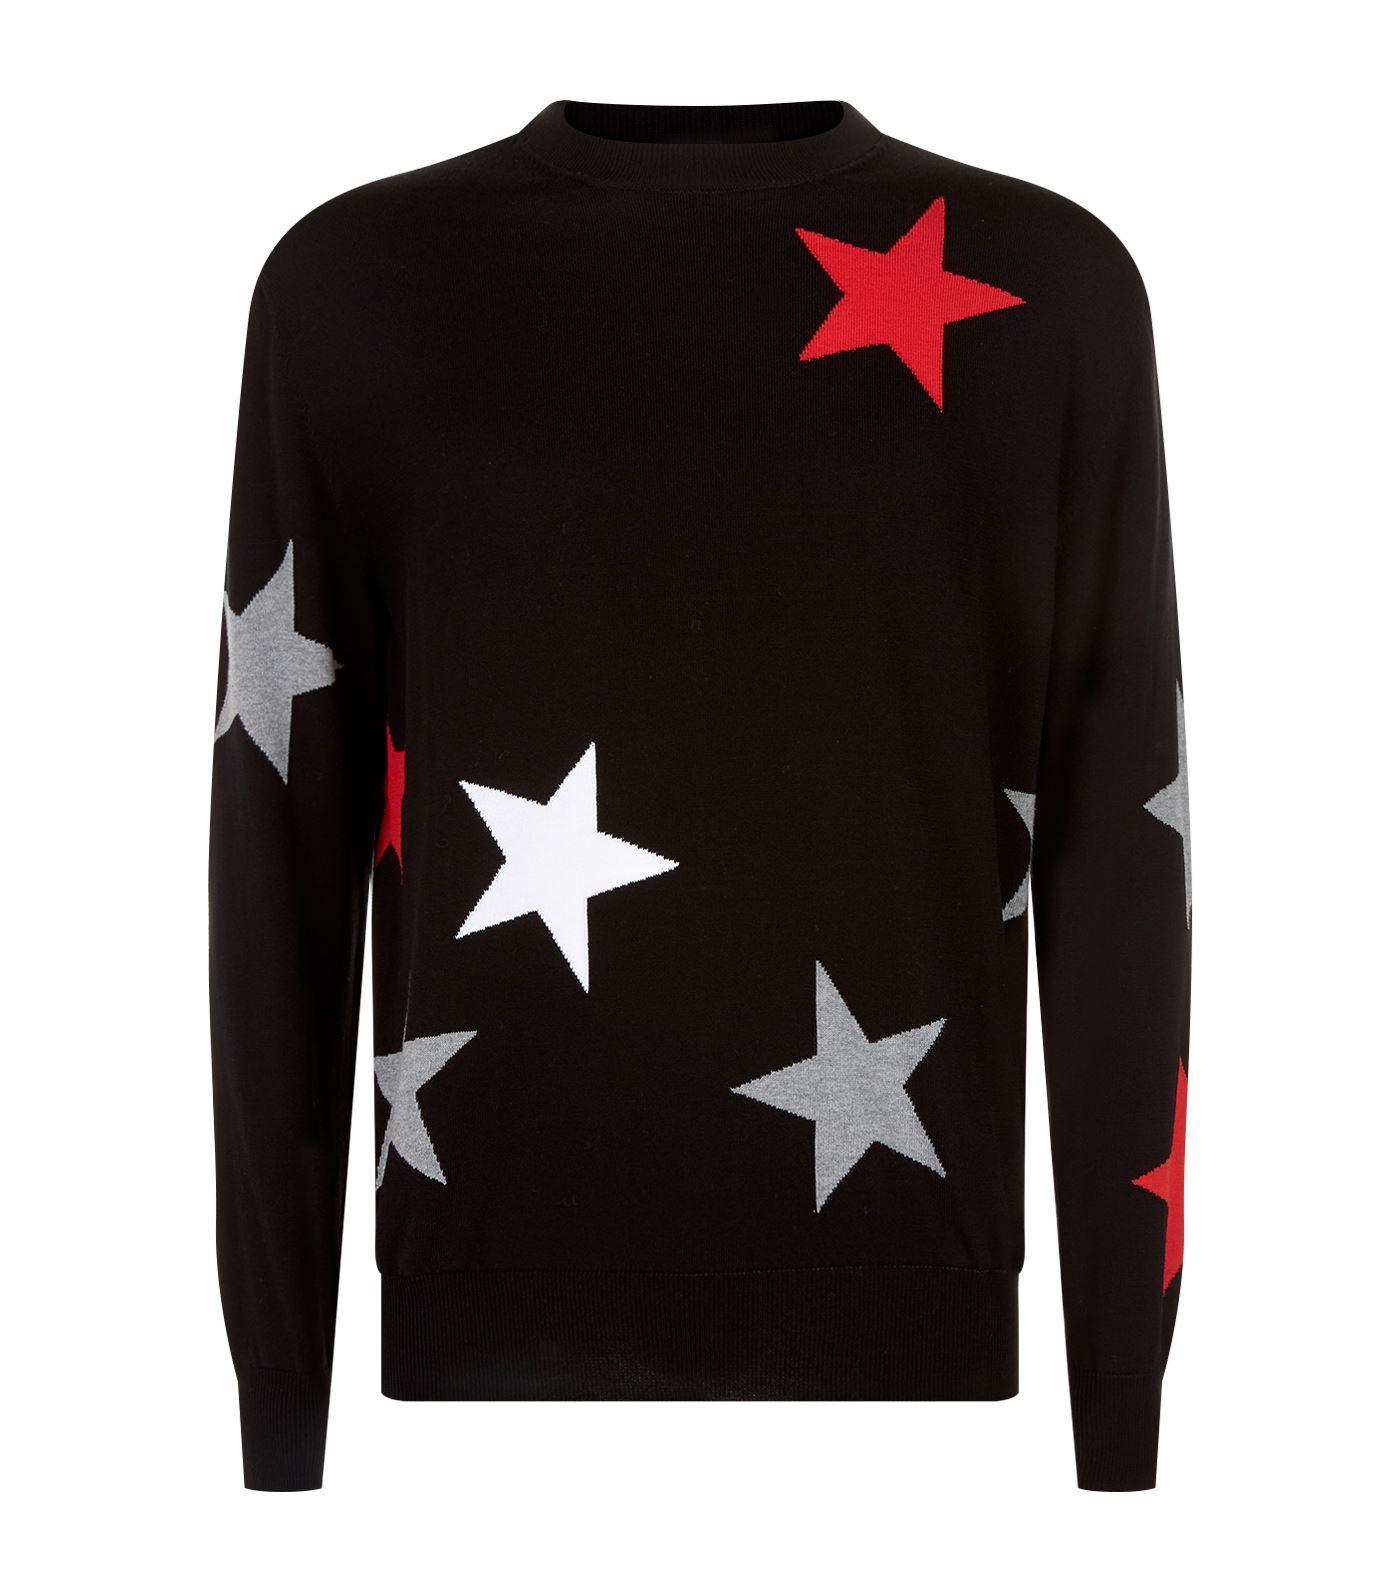 e63076be09524 Givenchy Star Cutout   Intarsia Wool Crewneck Sweater